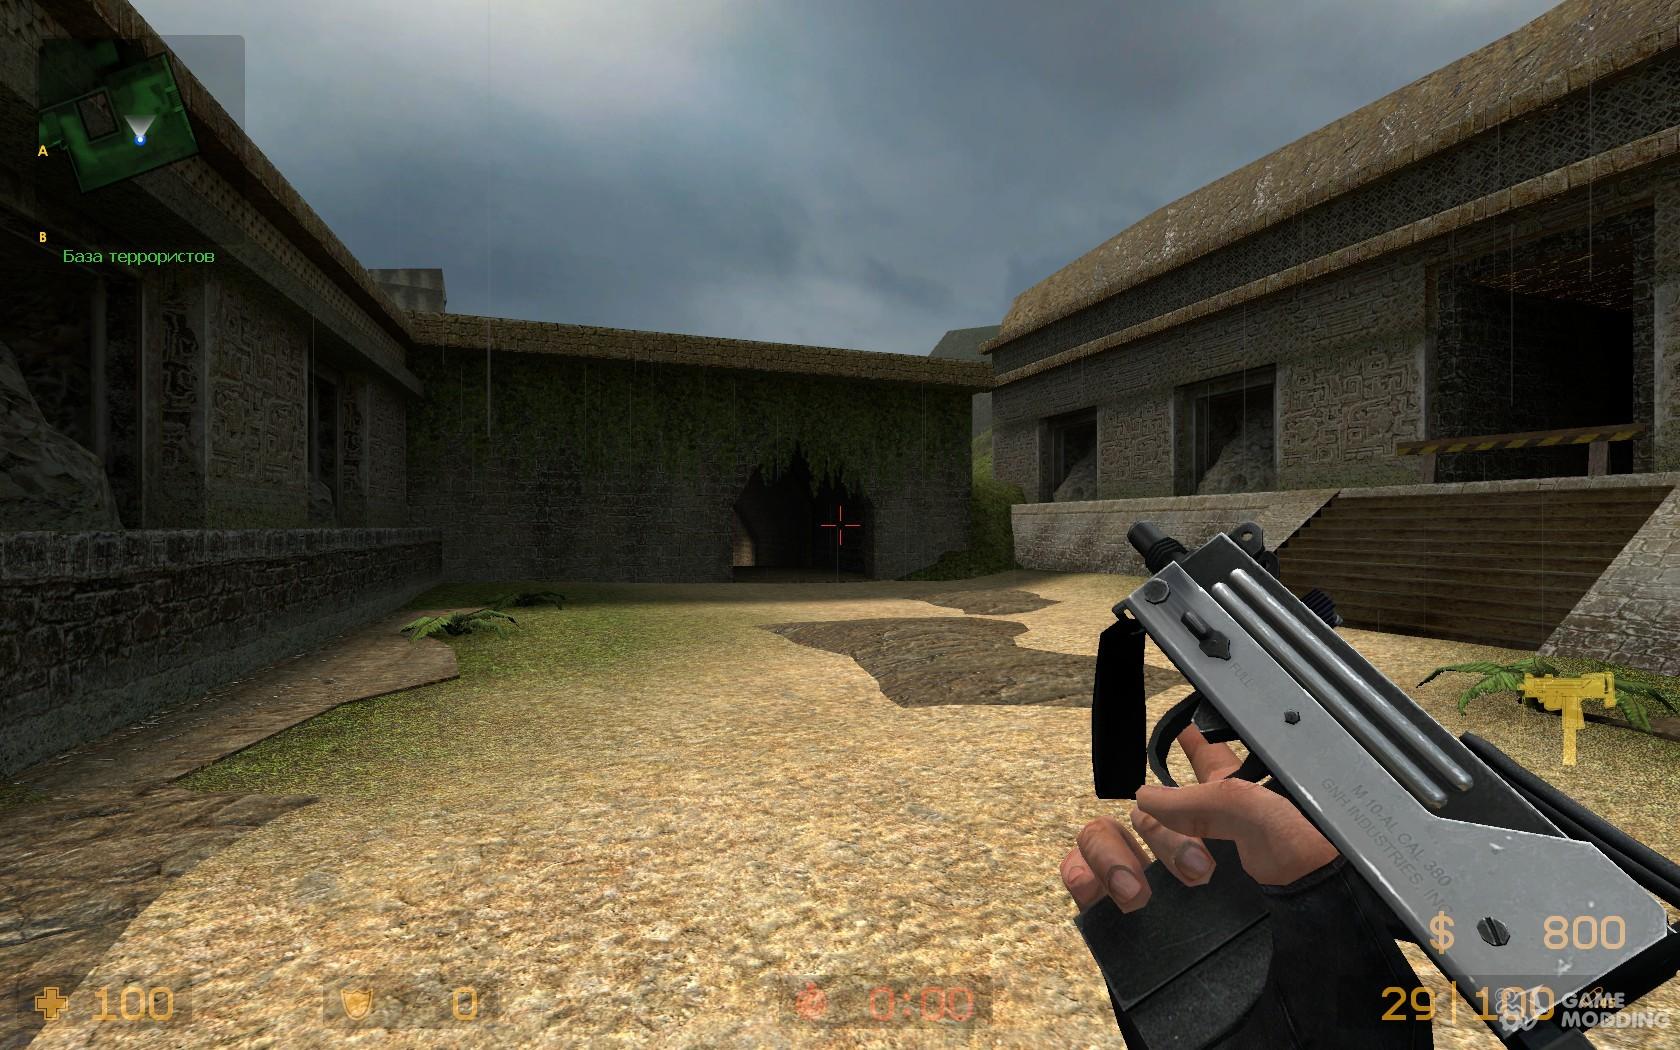 Counter-Strike Source on Steam